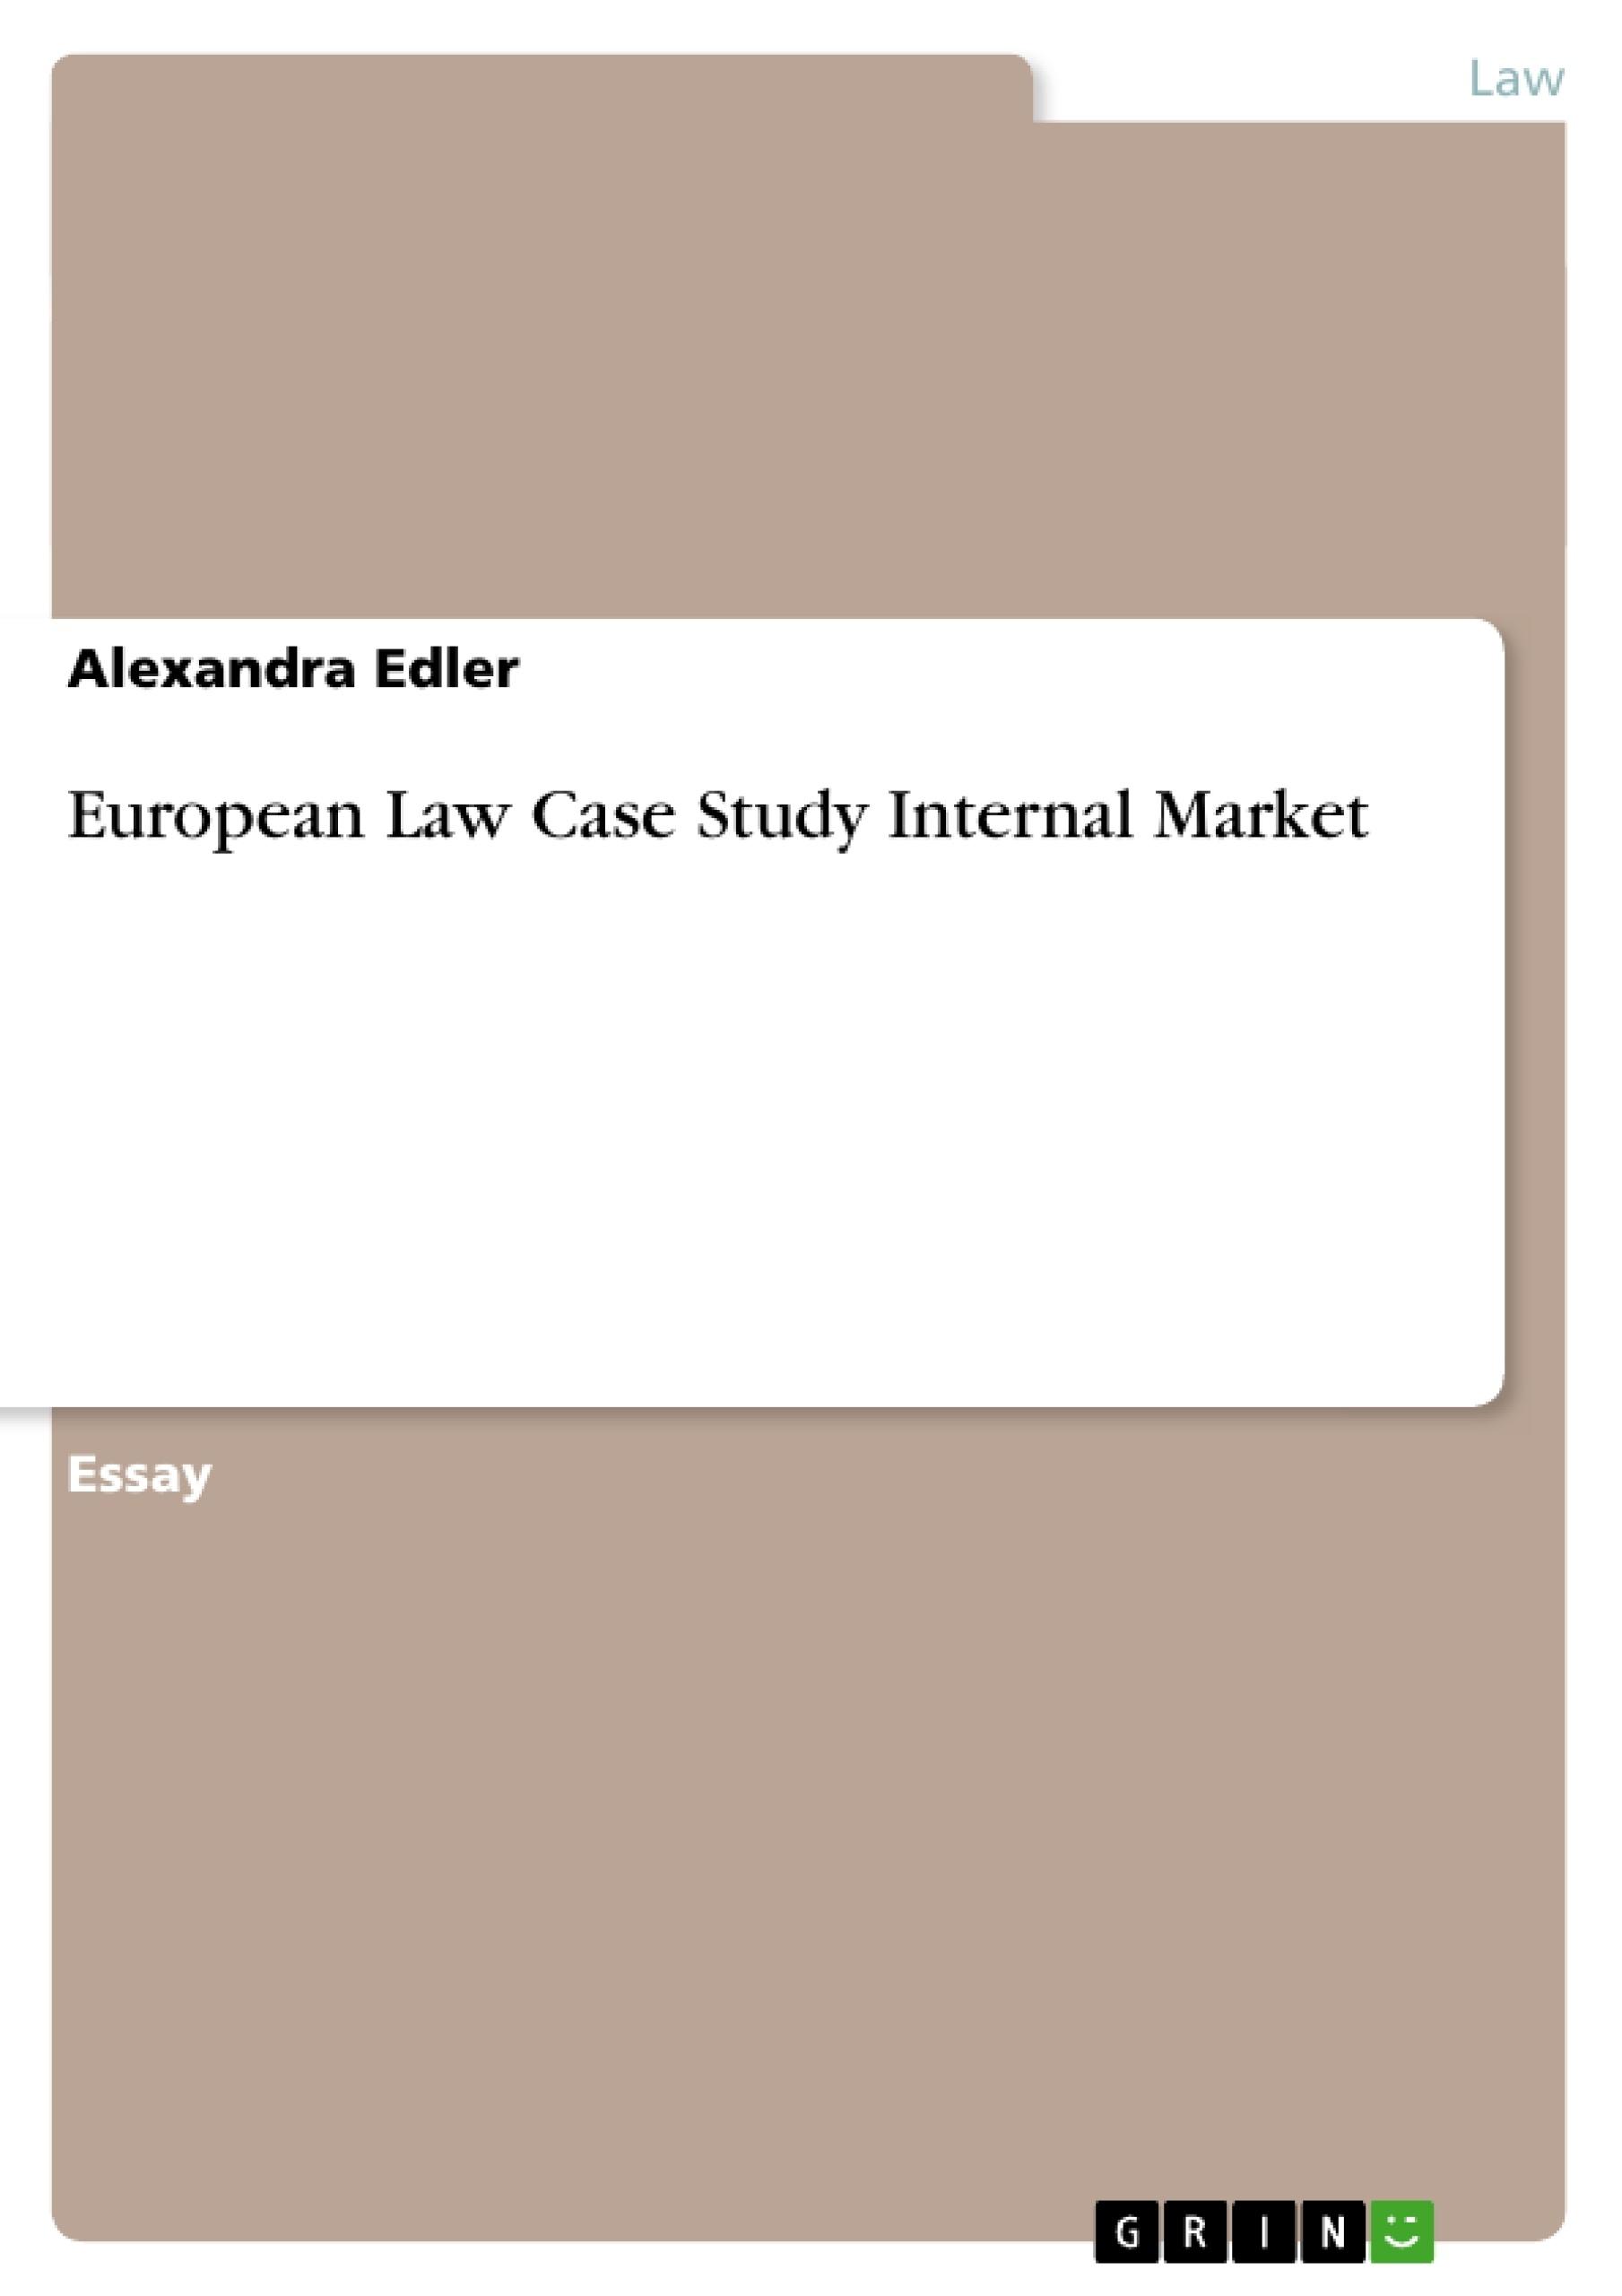 Title: European Law Case Study Internal Market